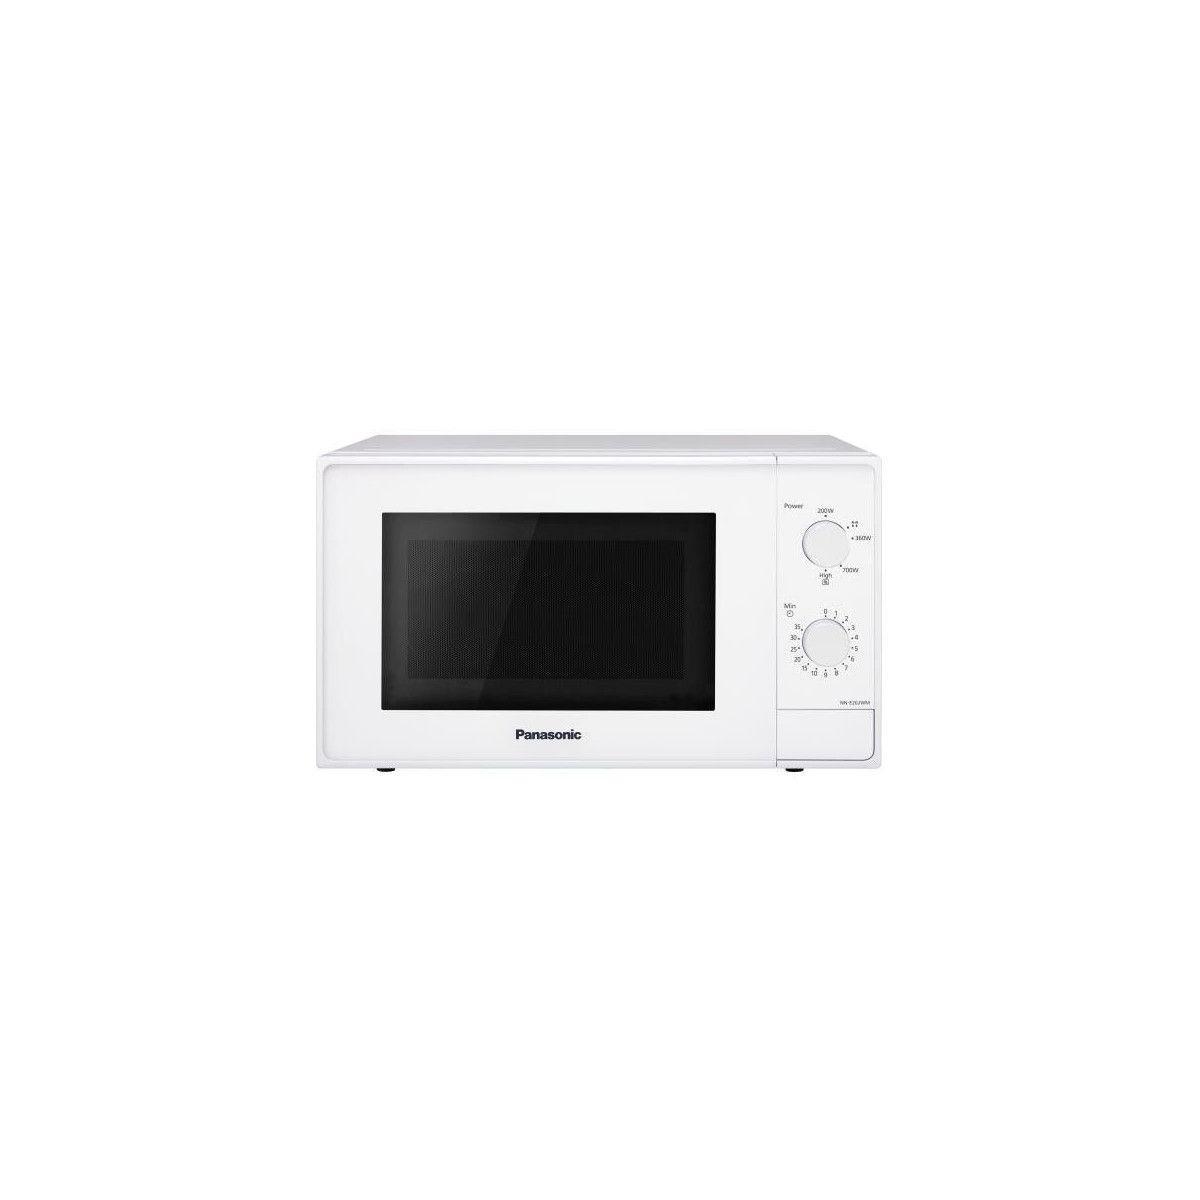 Panasonic Micro-ondes Pose Libre 20l Panasonic 800w 44cm, Nne20jw